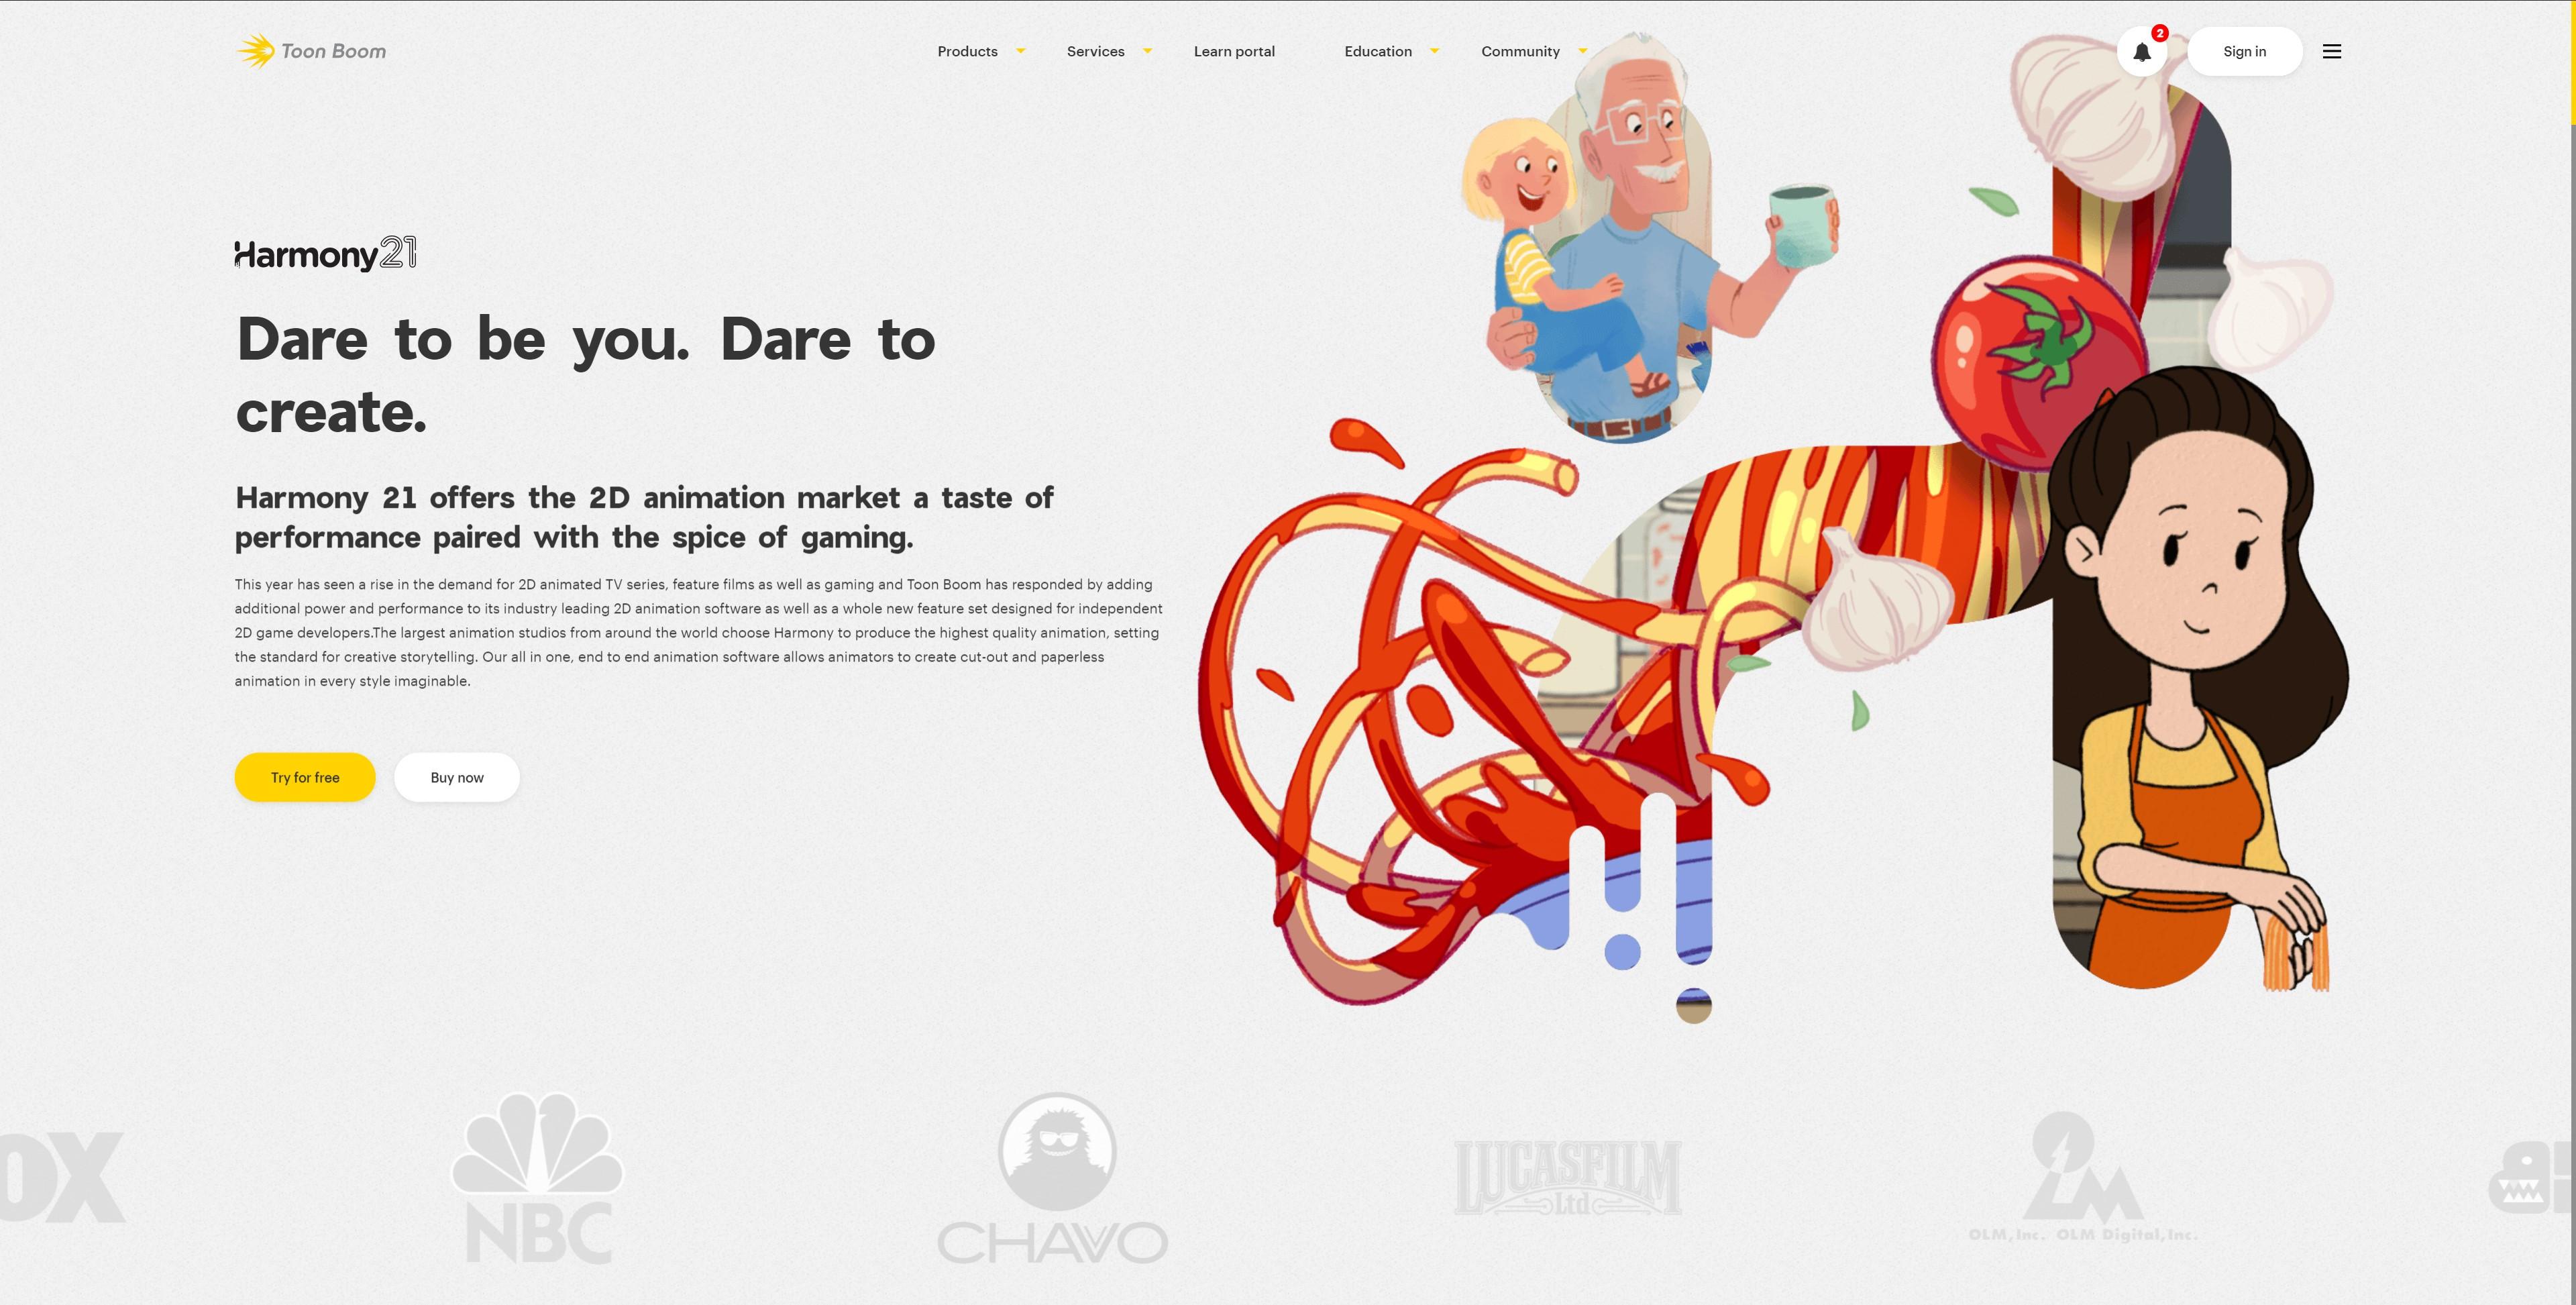 Screencap https://www.toonboom.com/products/harmony